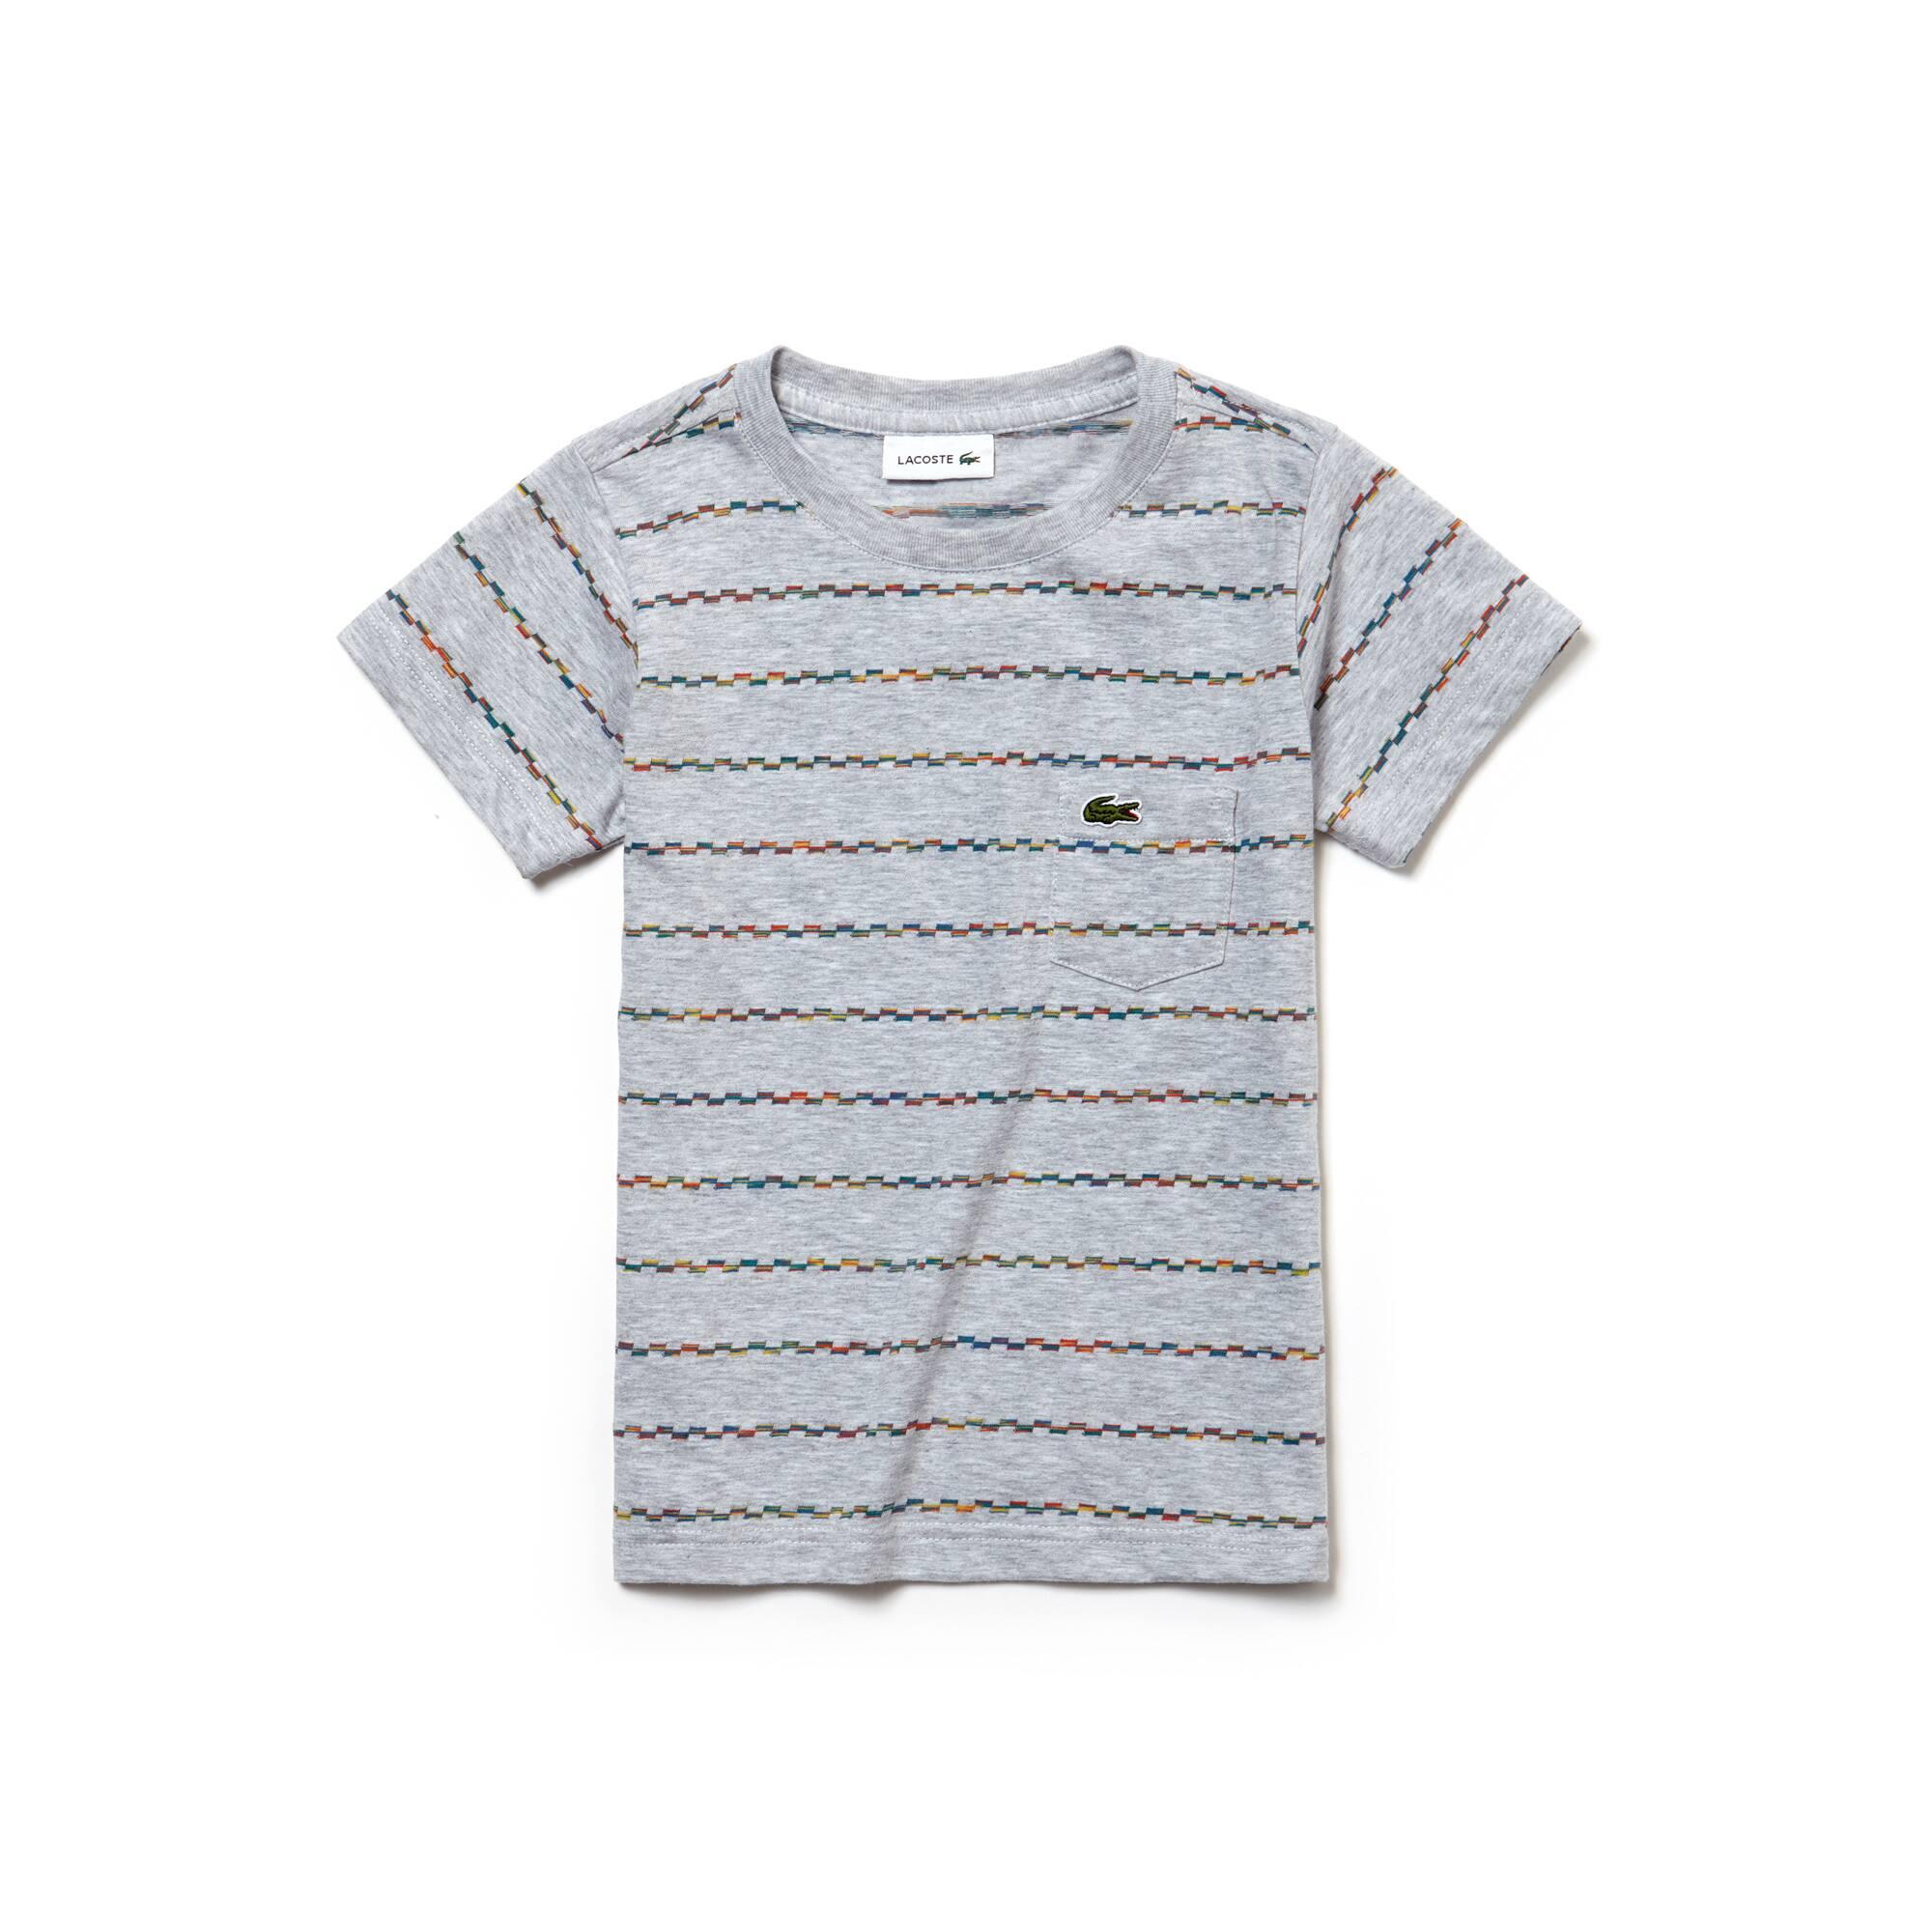 Boys' Crew Neck Multicolored Stripes Jacquard Jersey T-shirt